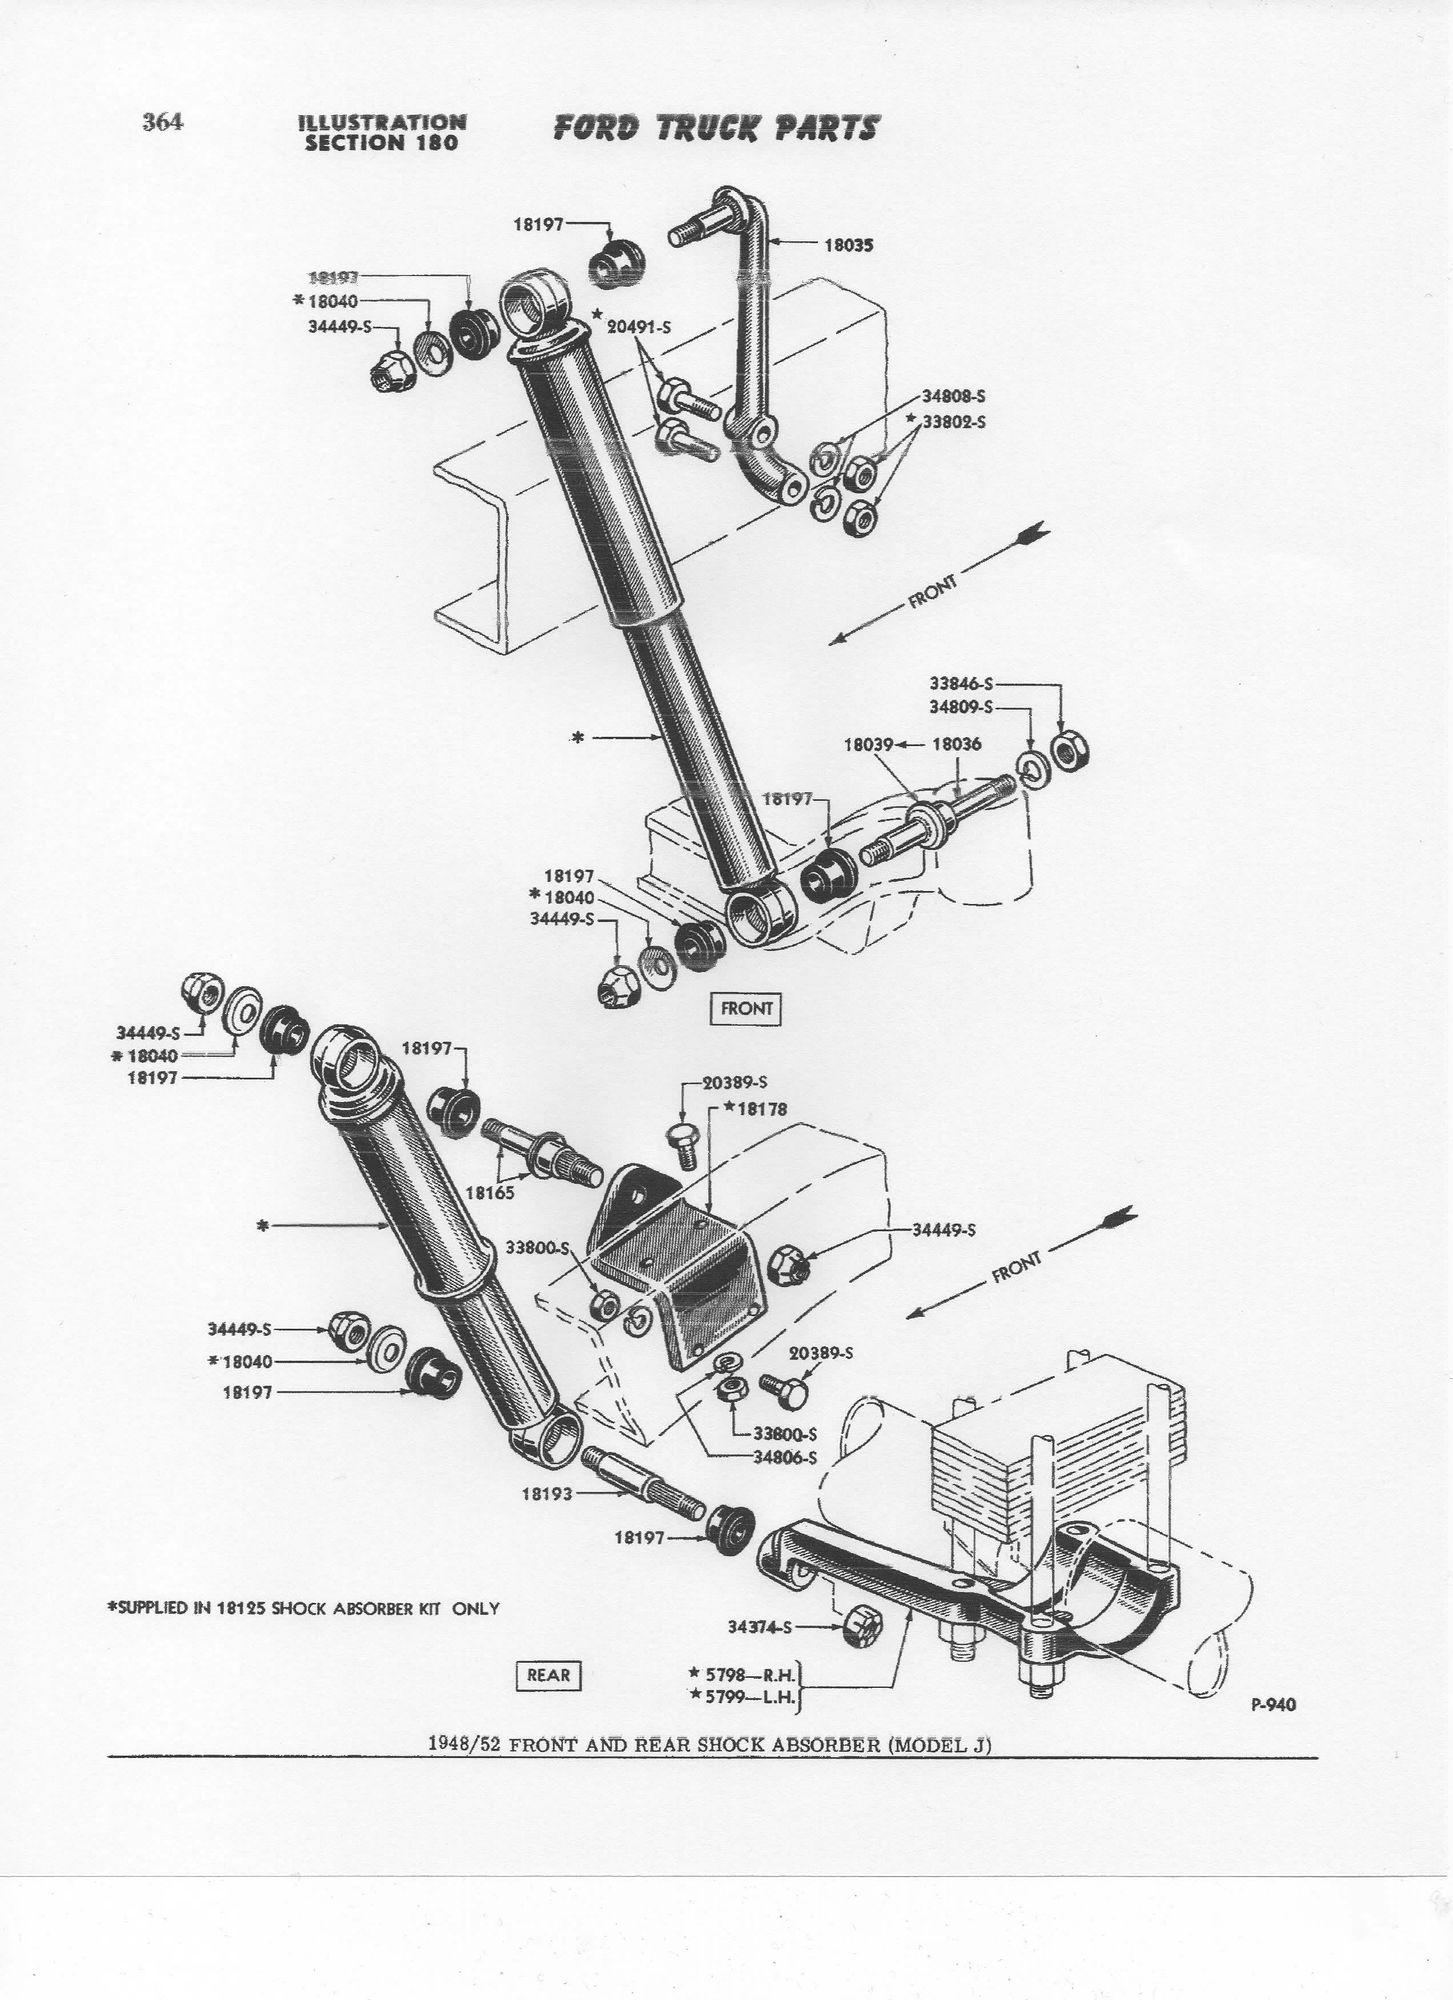 1950 f1 parts diagram - shock pins